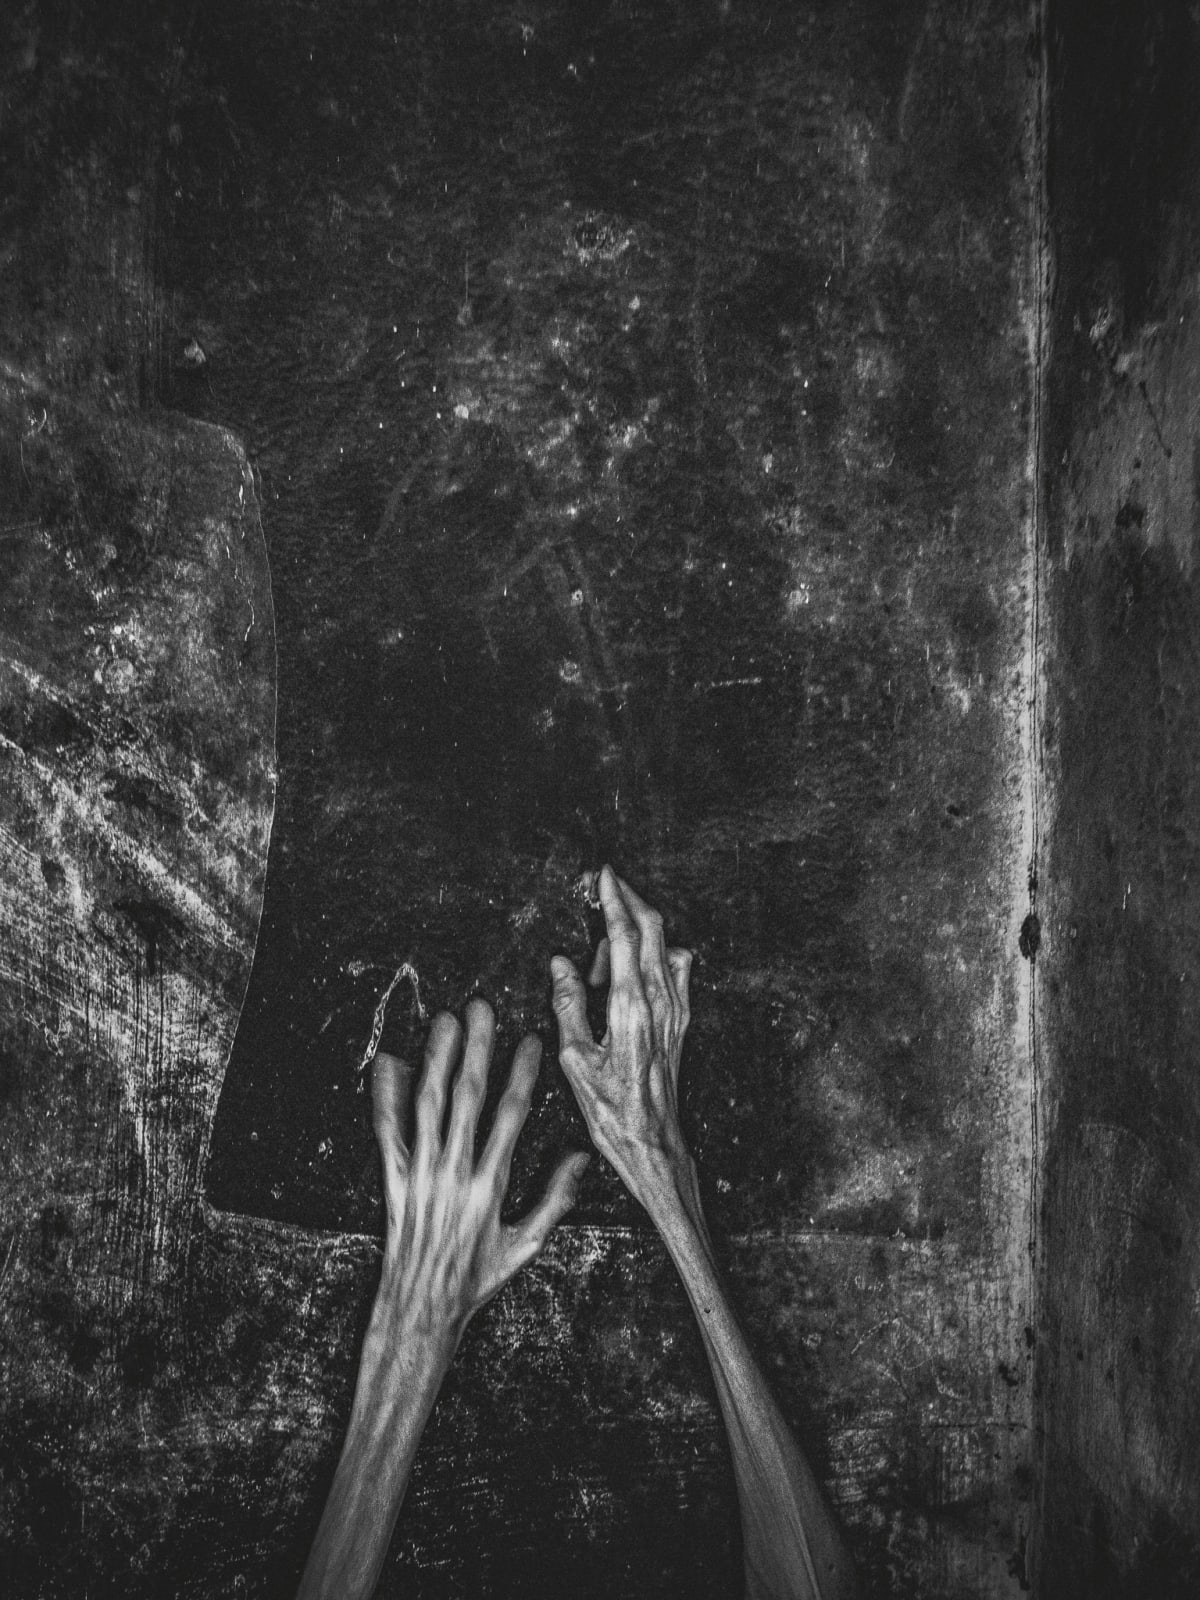 Lene Marie Fossen, Untitled Chios 8050081, 2017